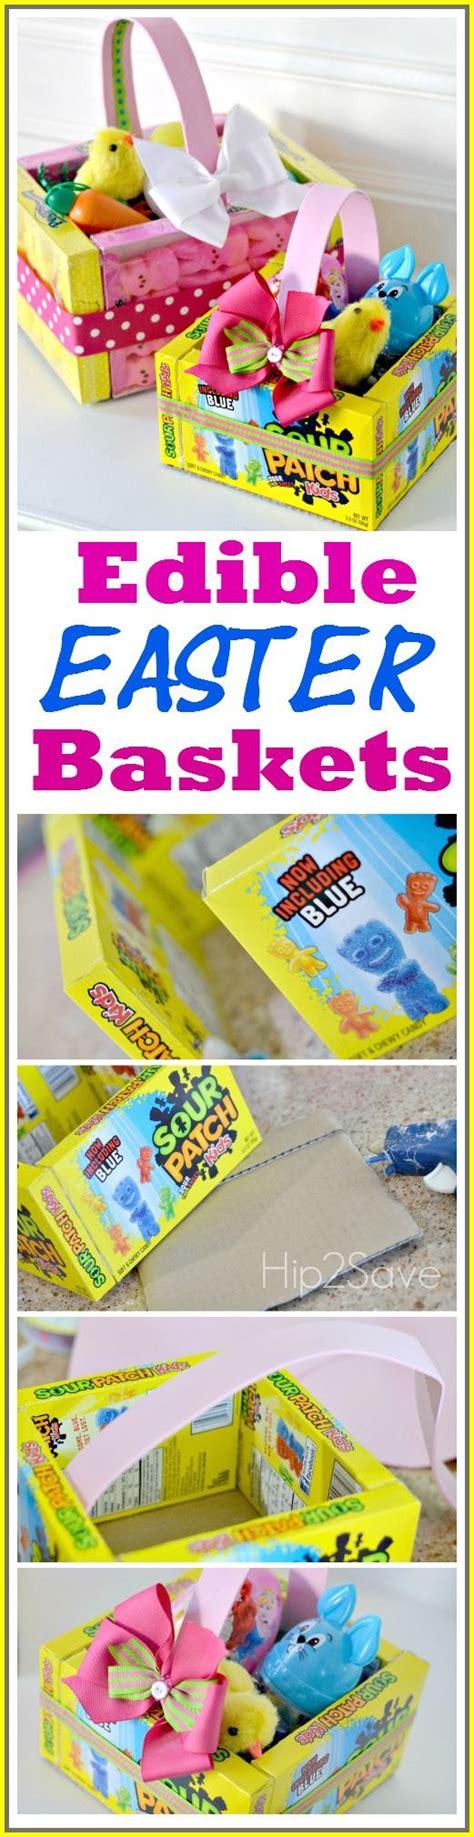 edible easter baskets easy easter craft hip2save edible easter baskets easy easter craft creative